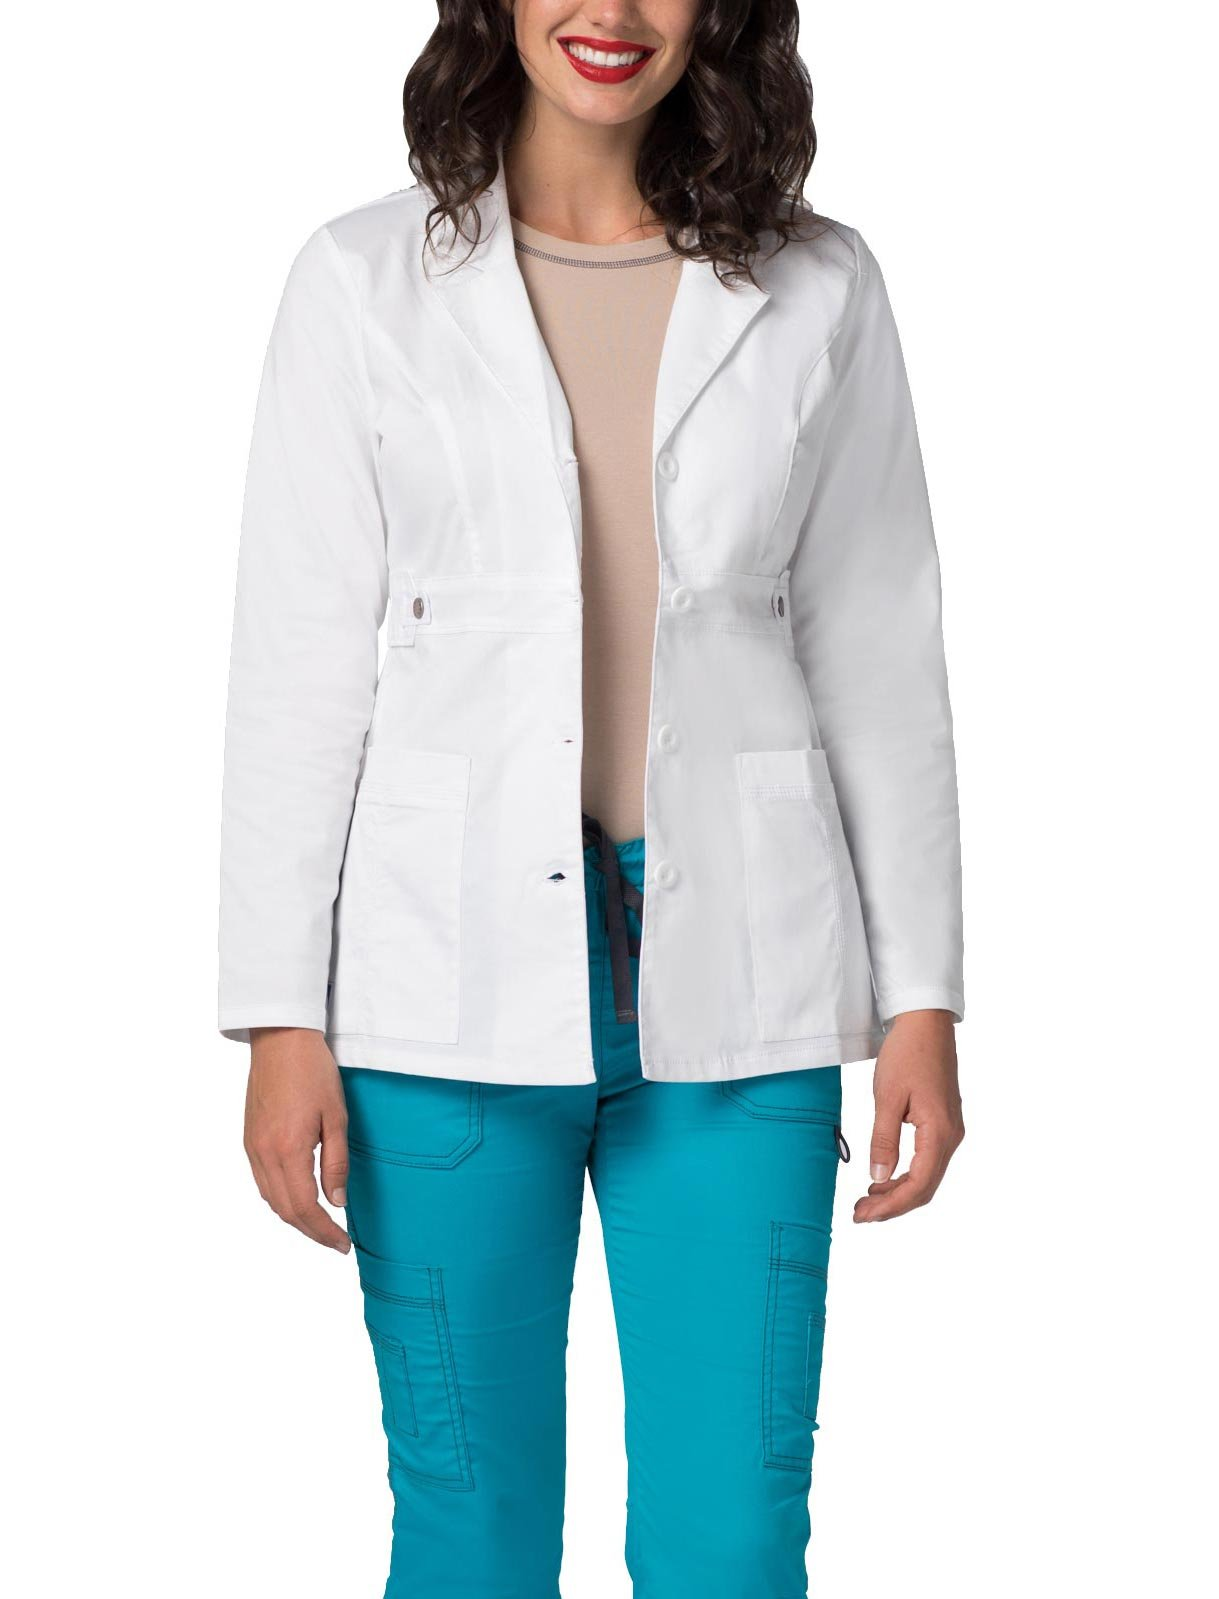 Adar Pop-Stretch Junior Fit Women's 28'''' Tab-Waist Lab Coat'' - 3300 - White - M